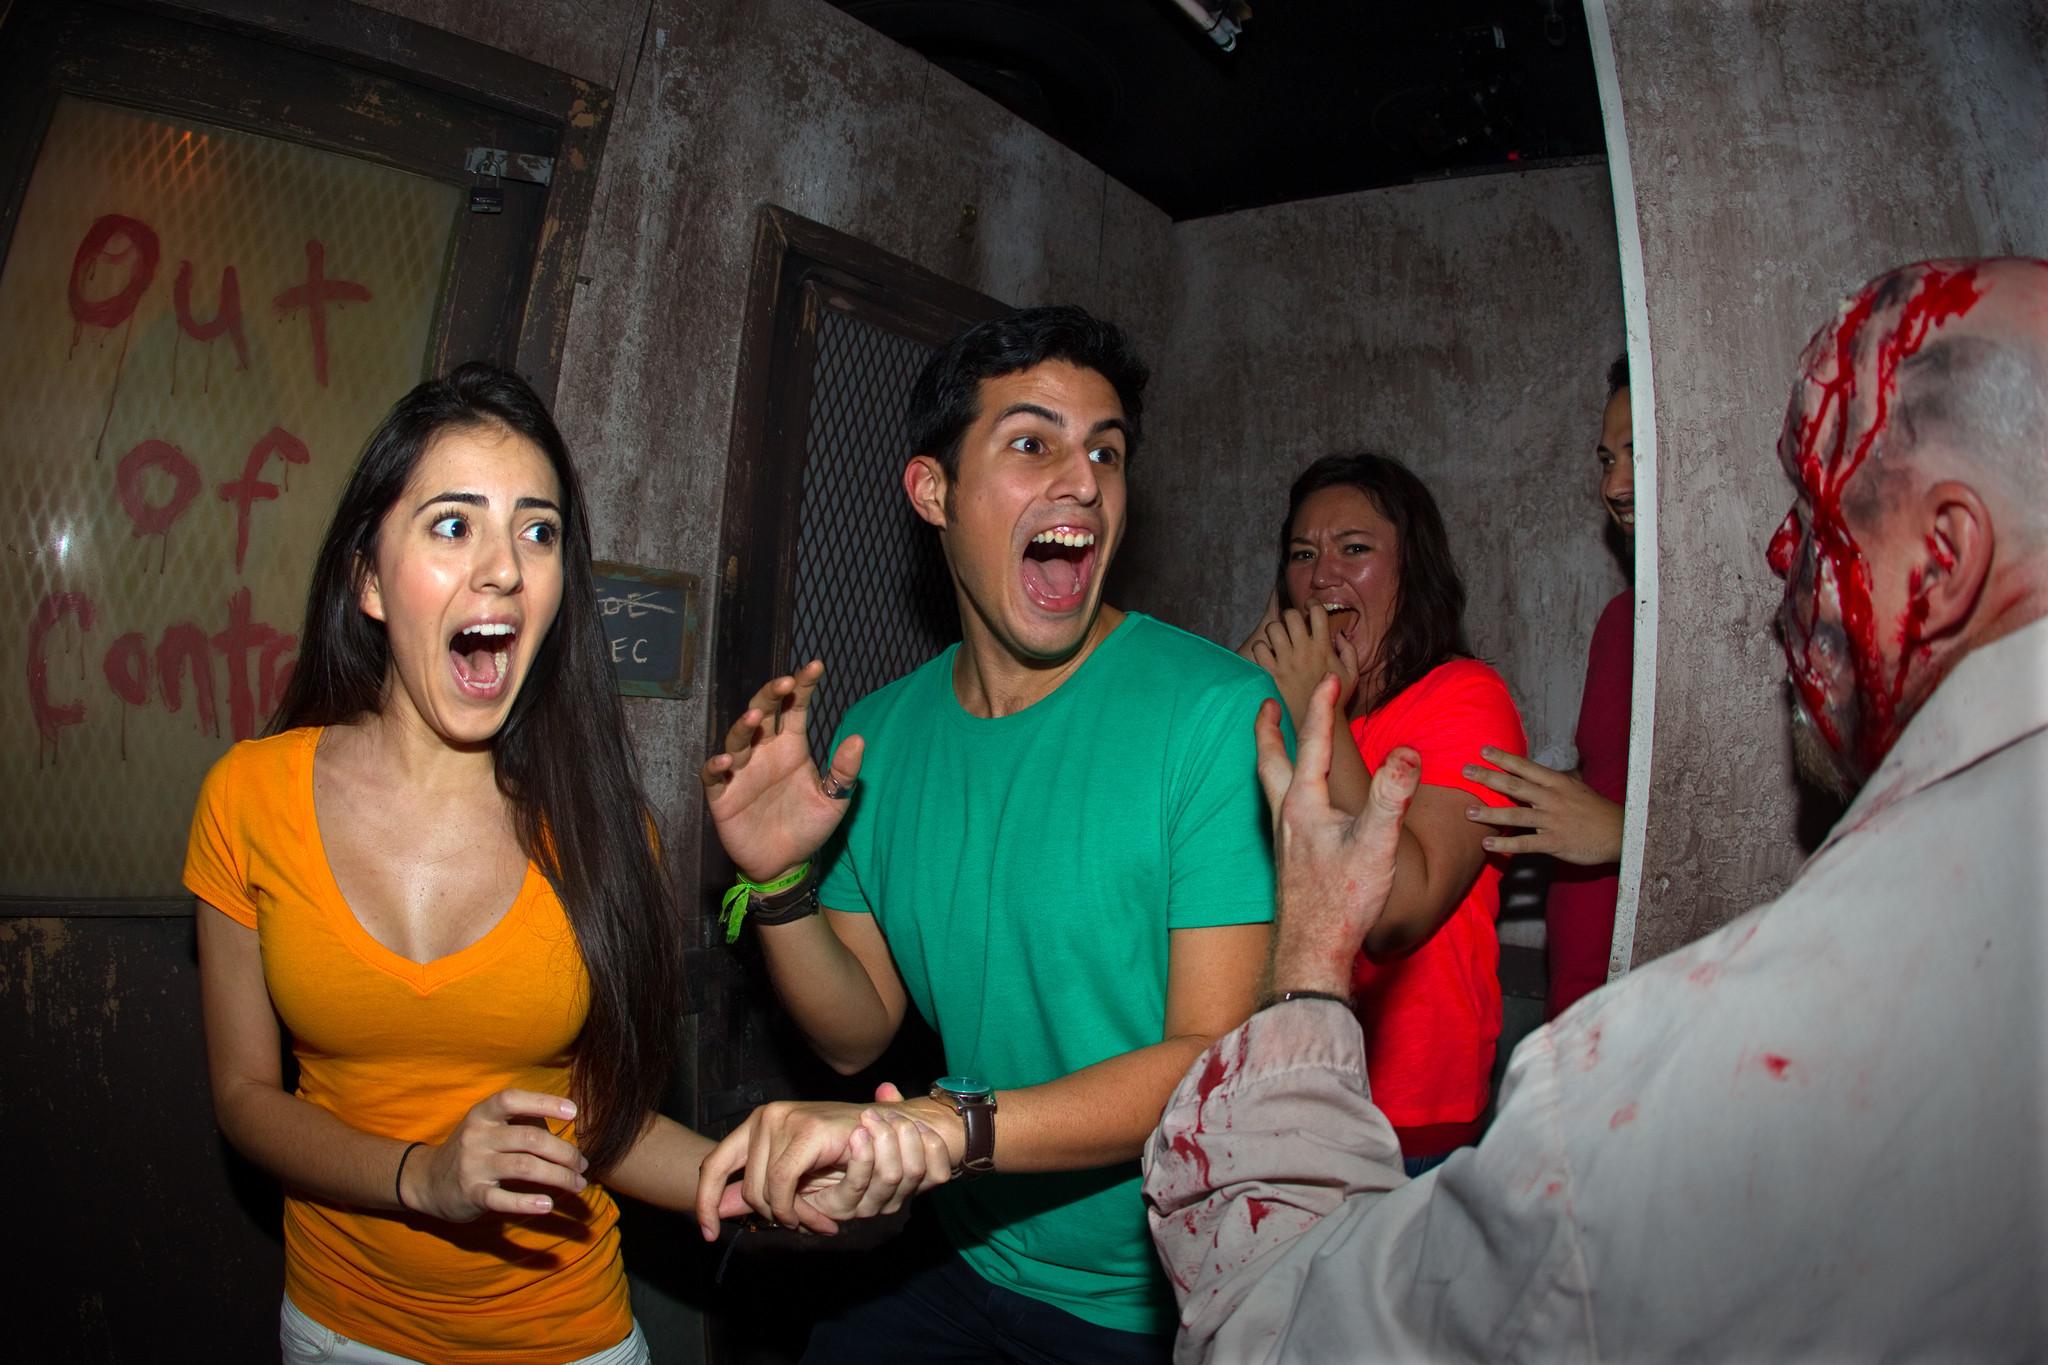 Howl O Scream Opens At Busch Gardens Tampa Bay Orlando Sentinel